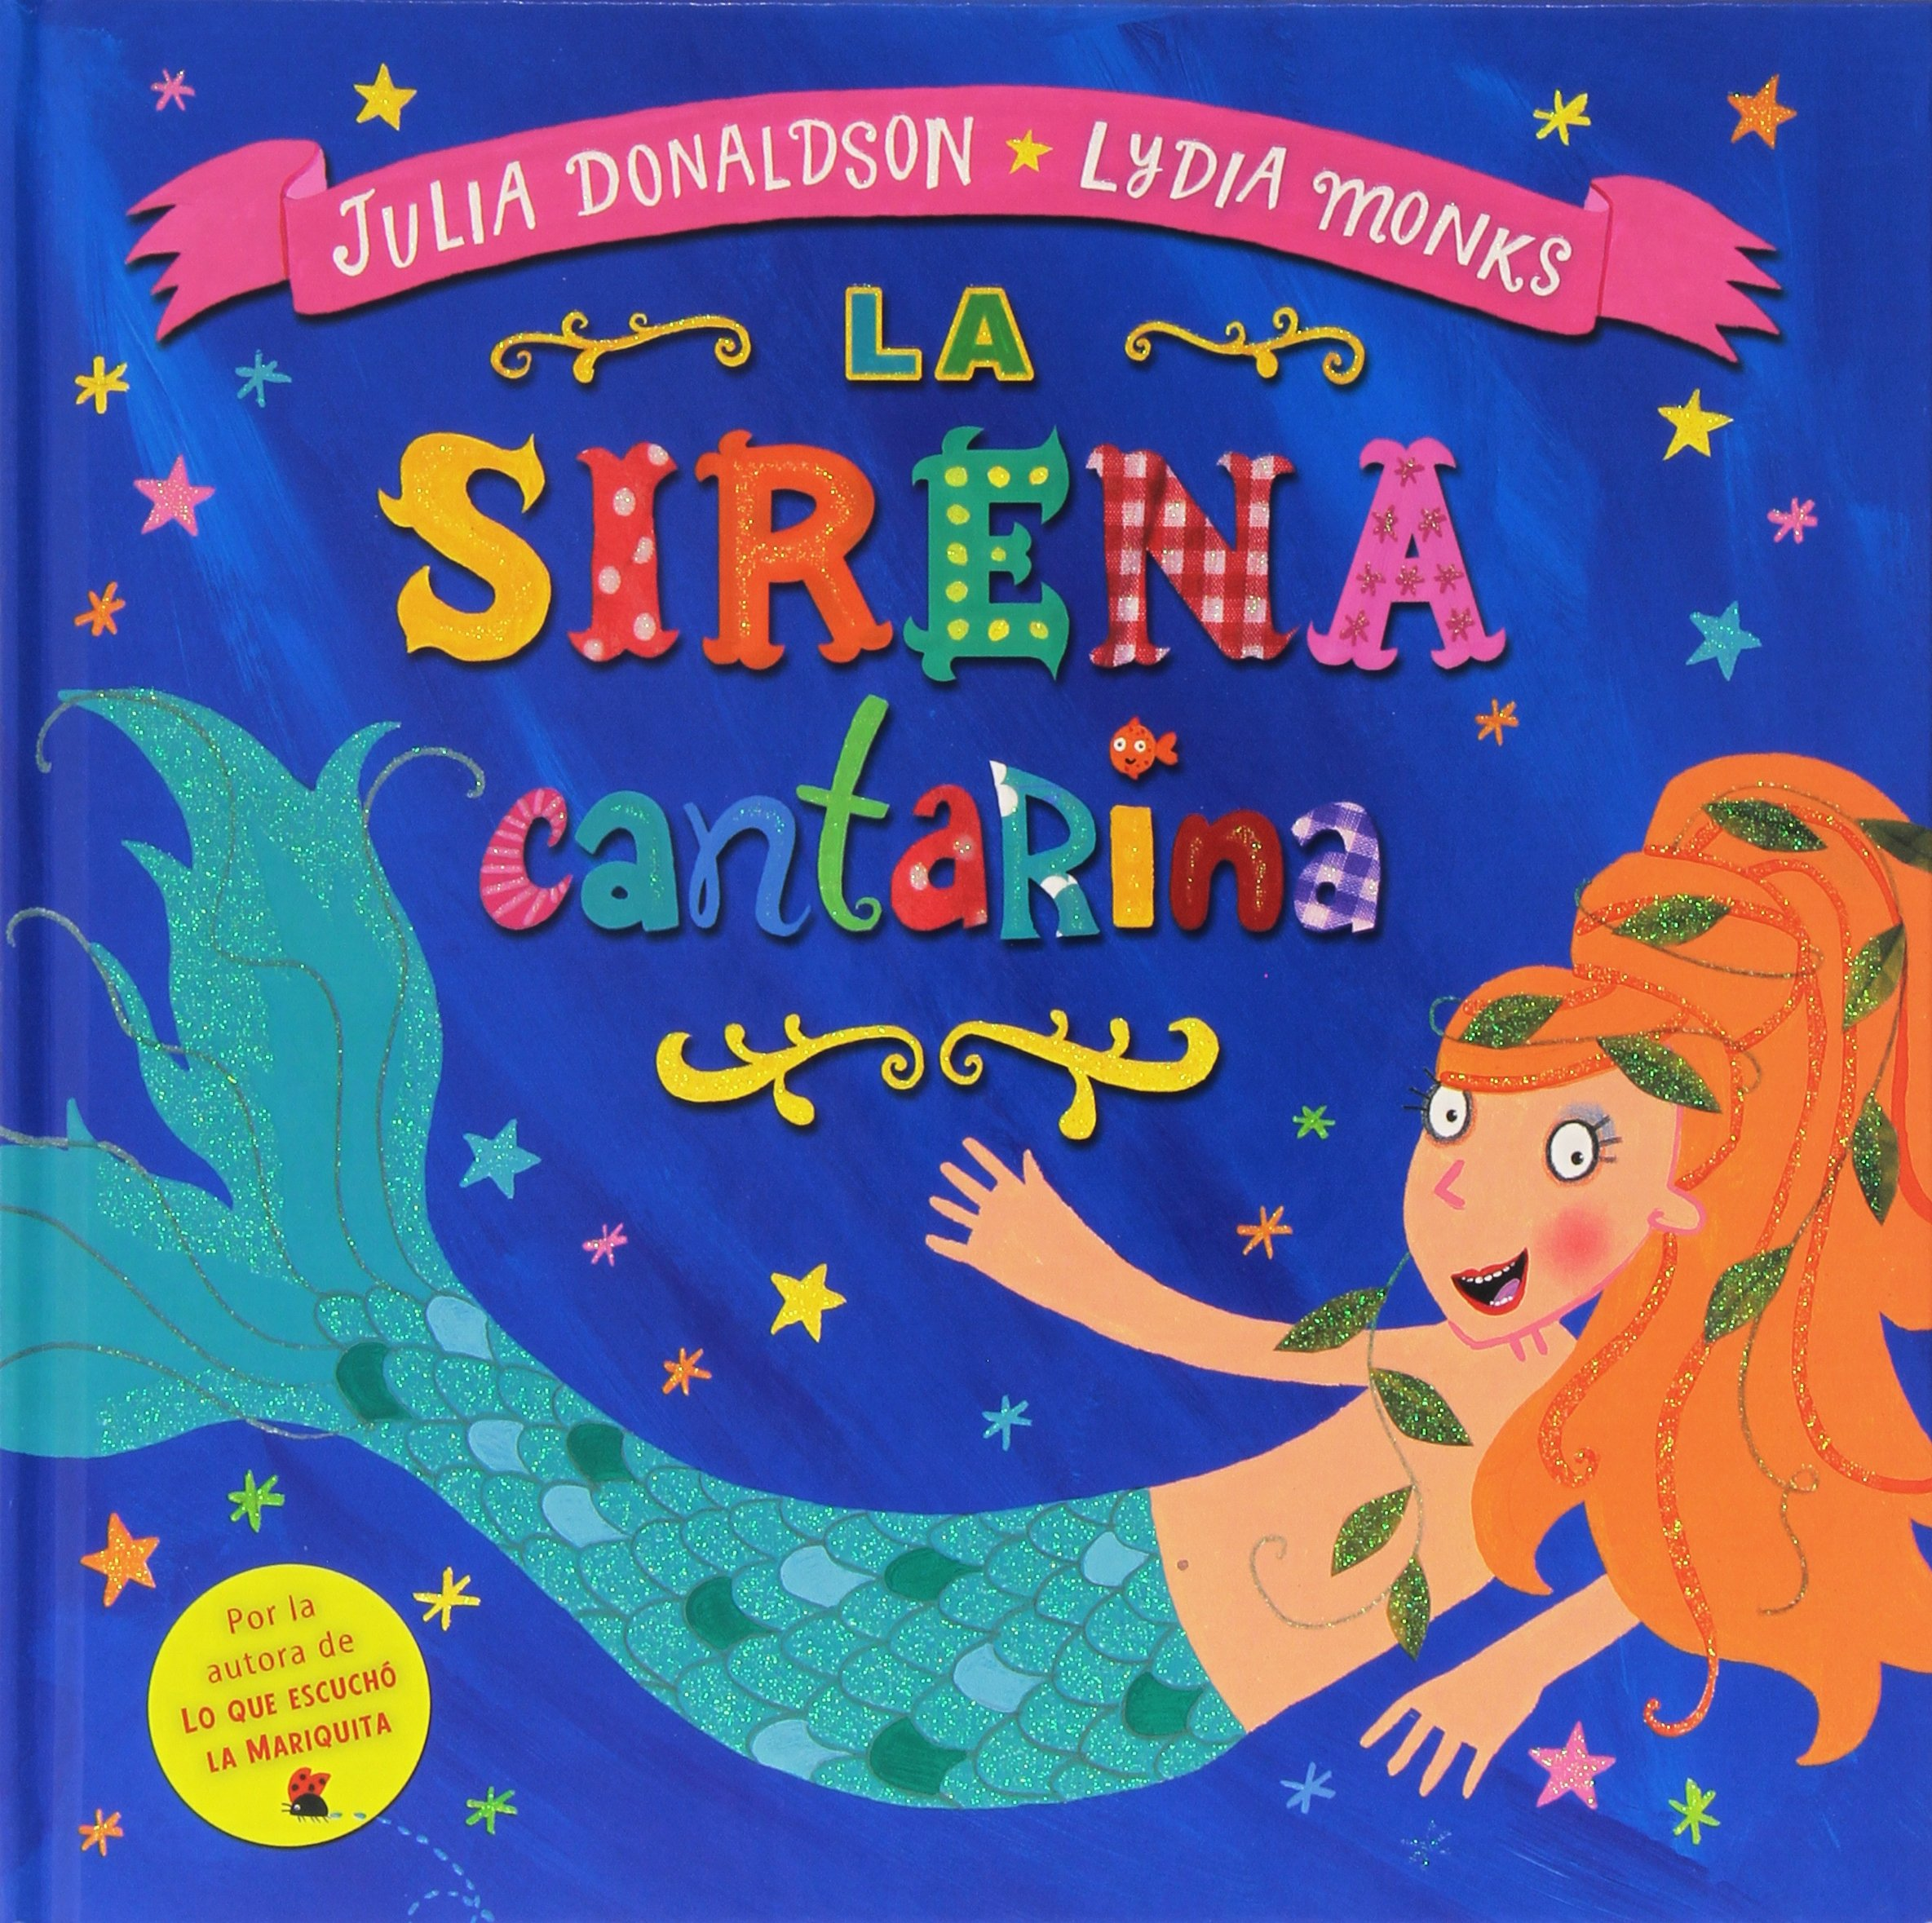 La sirena cantarina: Amazon.es: Julia Donaldson, Lydia Monks, Enrique Hurtado López: Libros